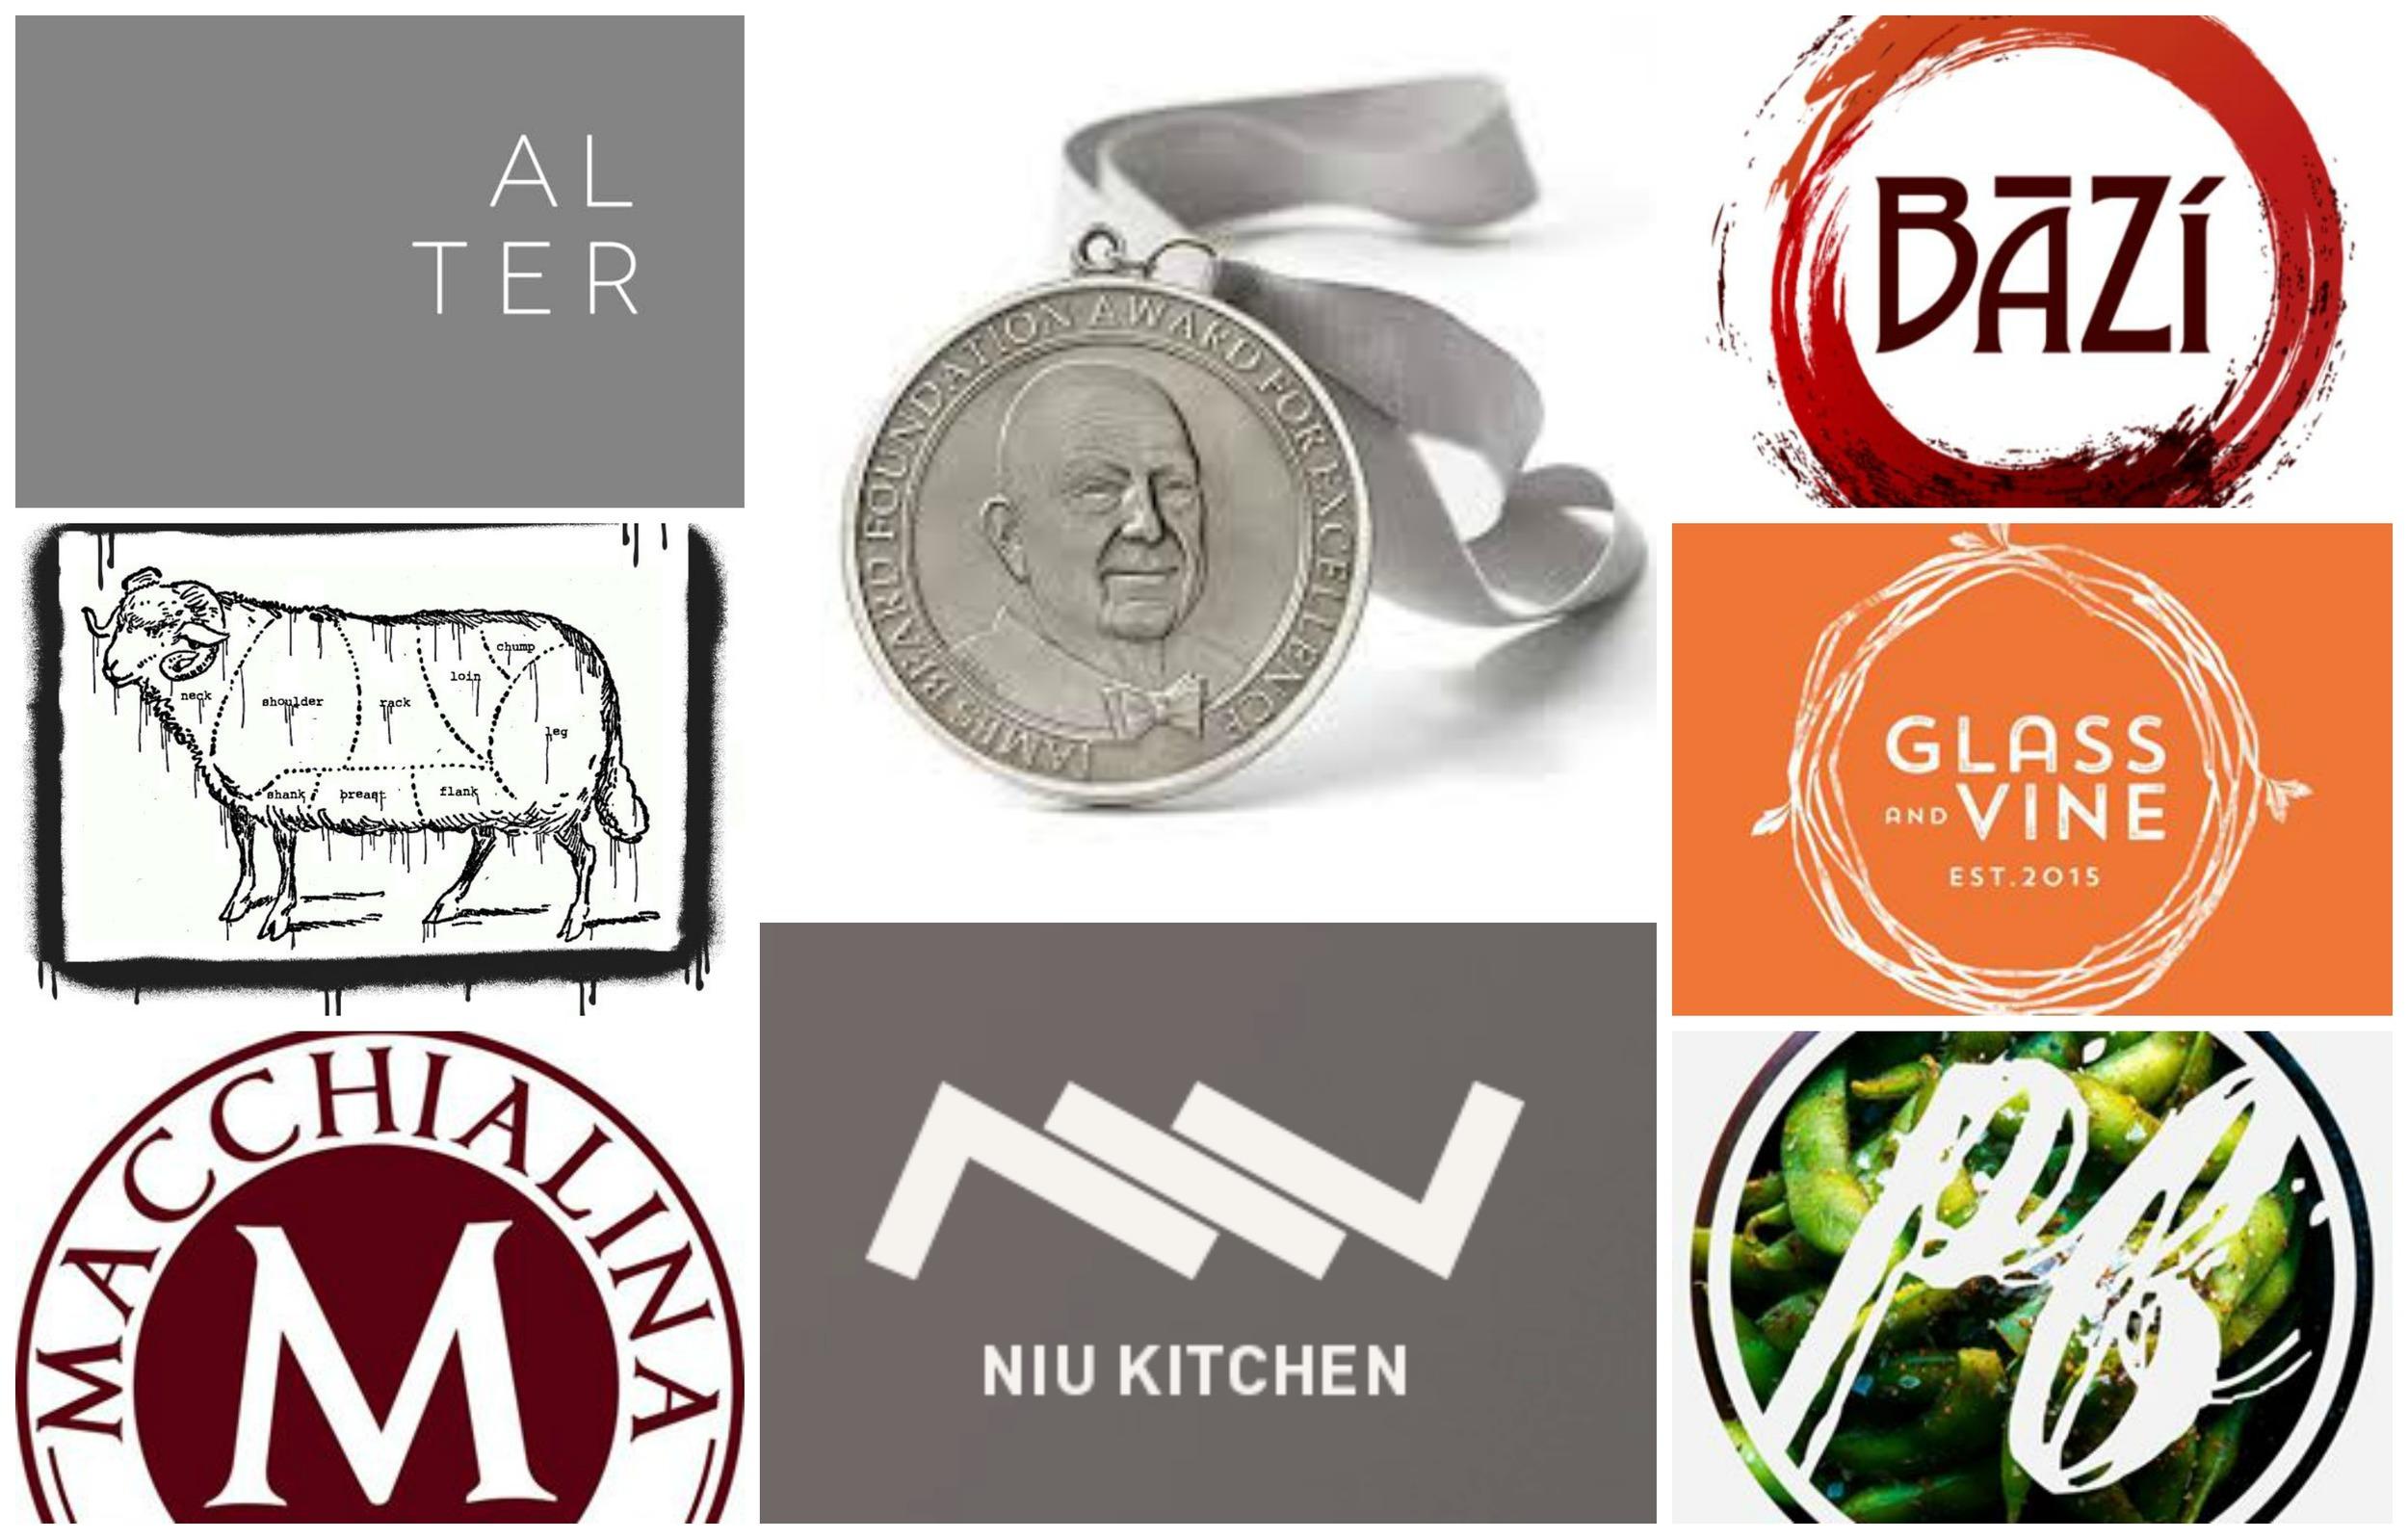 Miami James Beard Foundation Award Semifinalists 2016